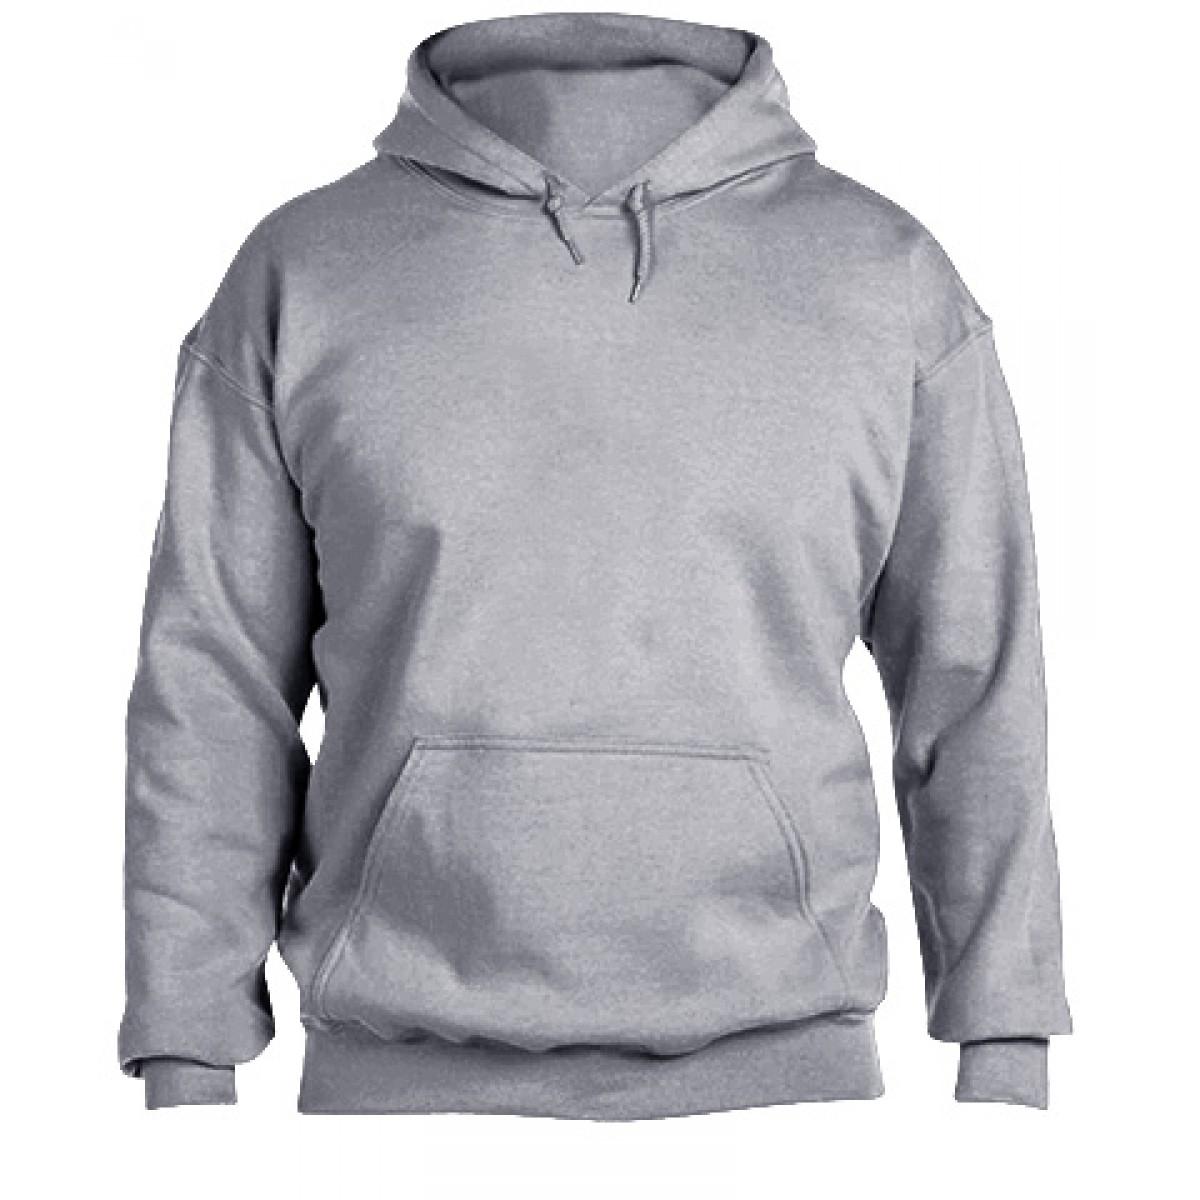 Hooded Sweatshirt 50/50 Heavy Blend-Sports Grey-2XL